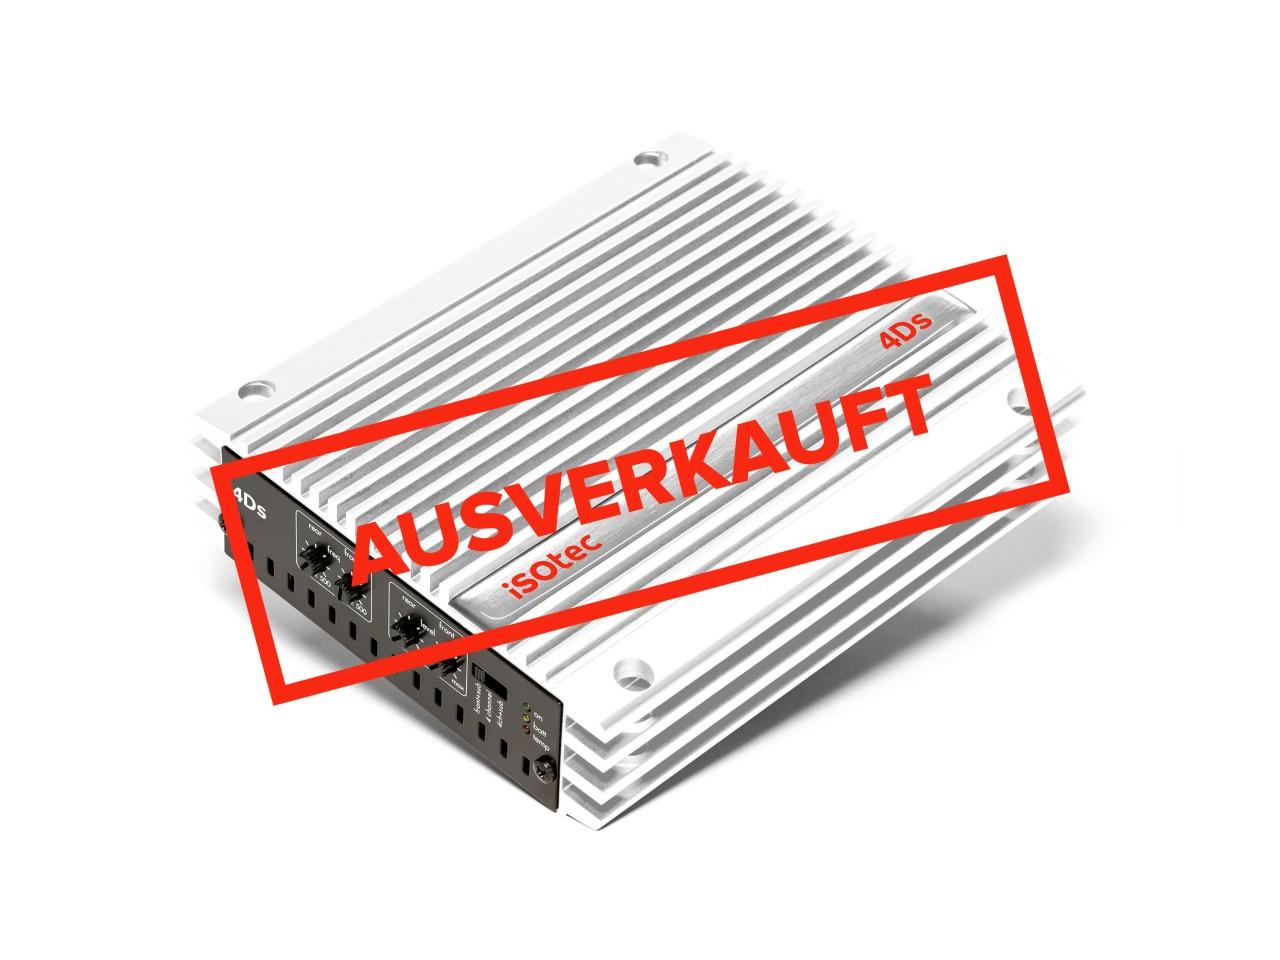 Car-HiFi Endstufe 4Ds special white edition - bereits AUSVERKAUFT